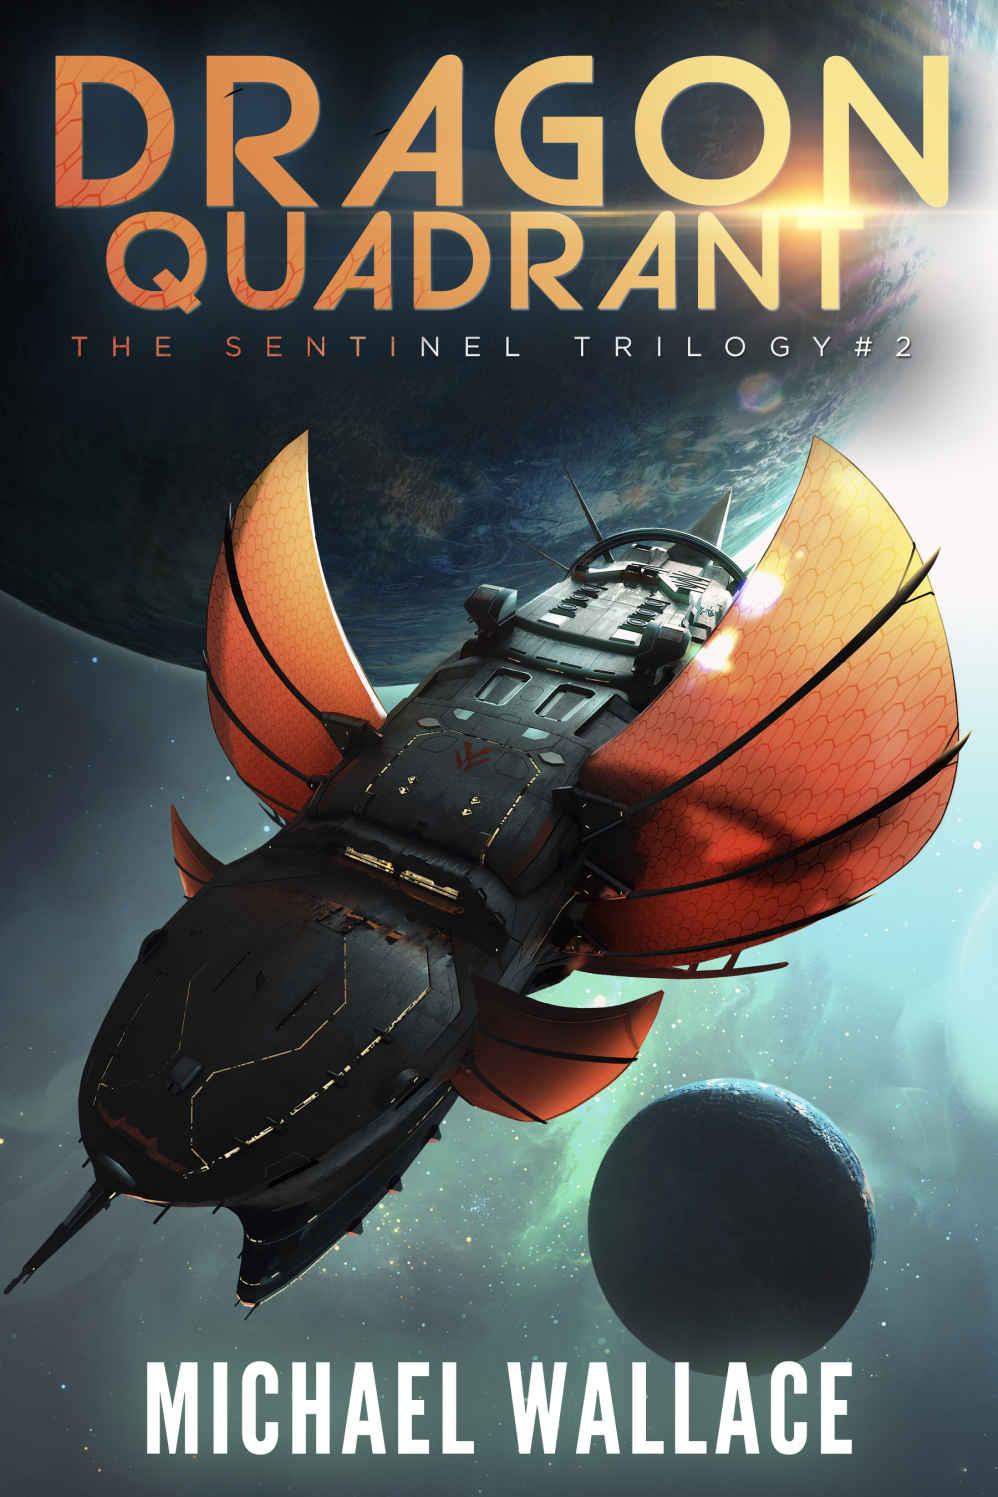 Dragon Quadrant